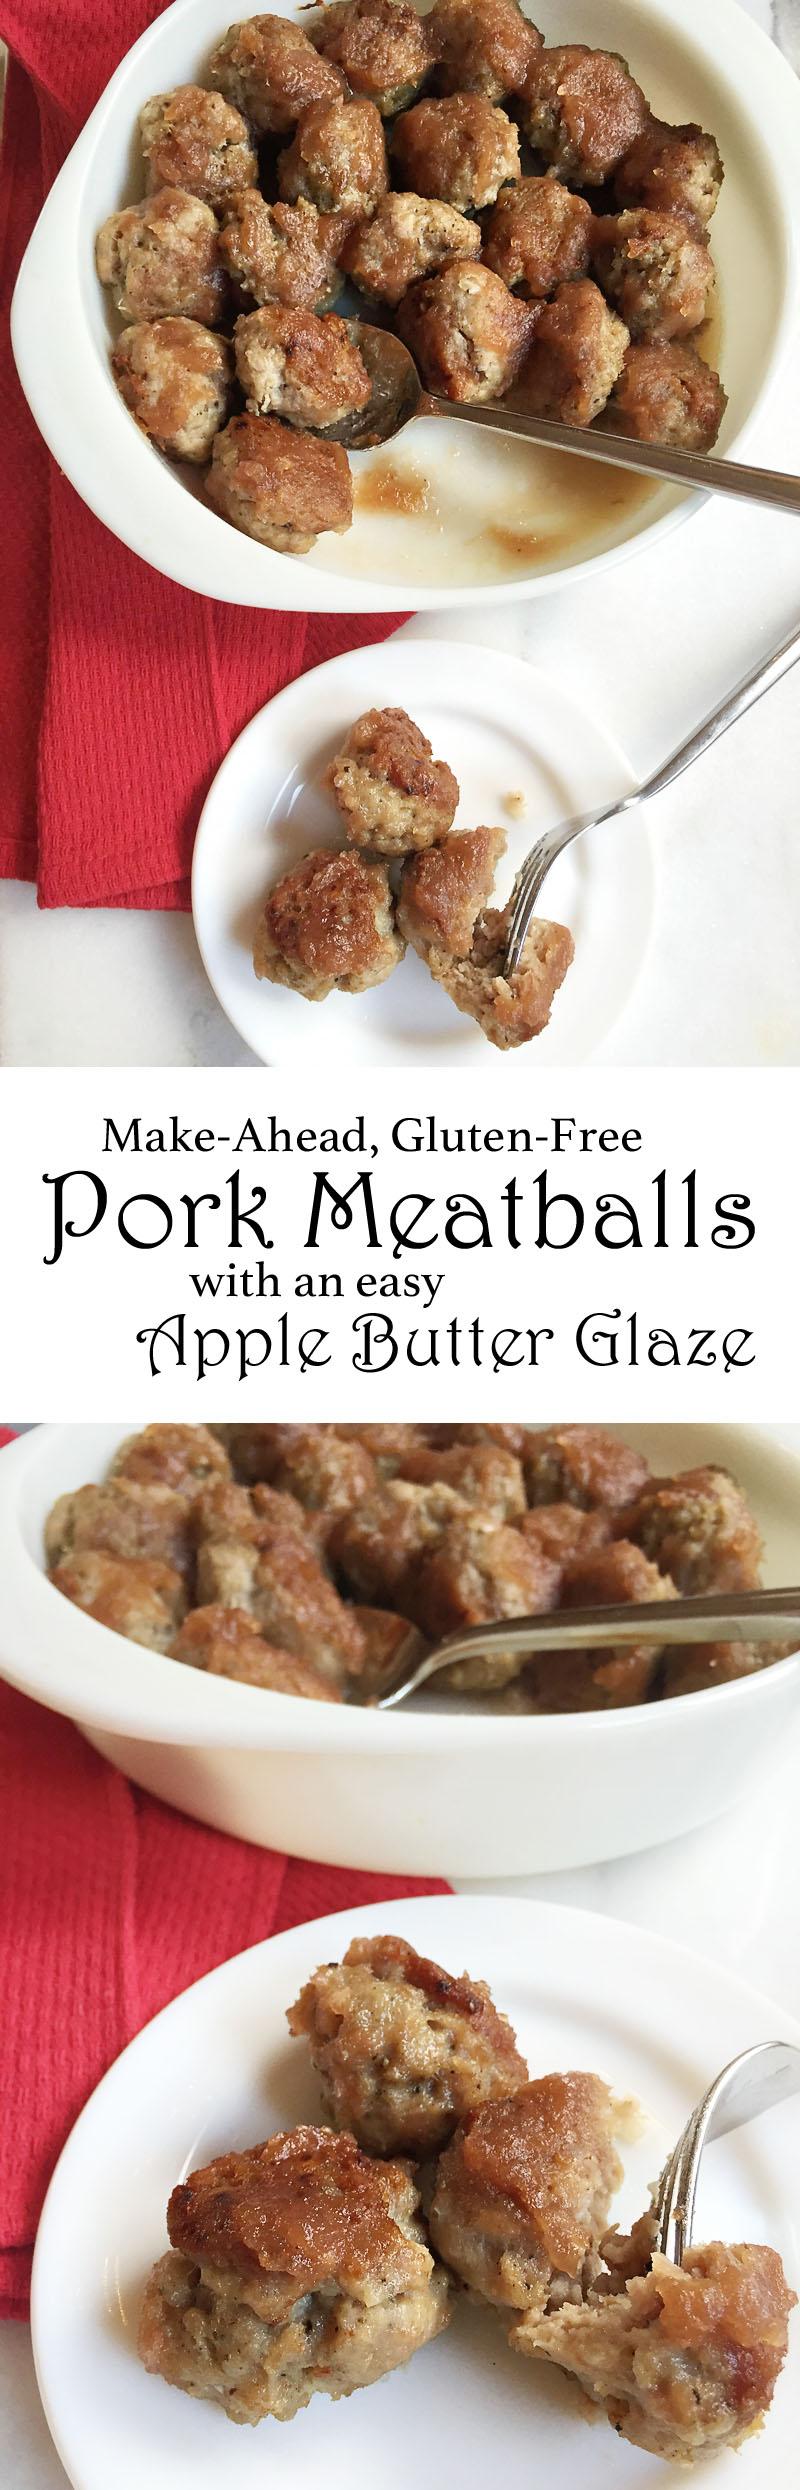 Make-Ahead Gluten-Free Pork Meatballs with an Easy Apple Butter Glaze | Sweet Anna's